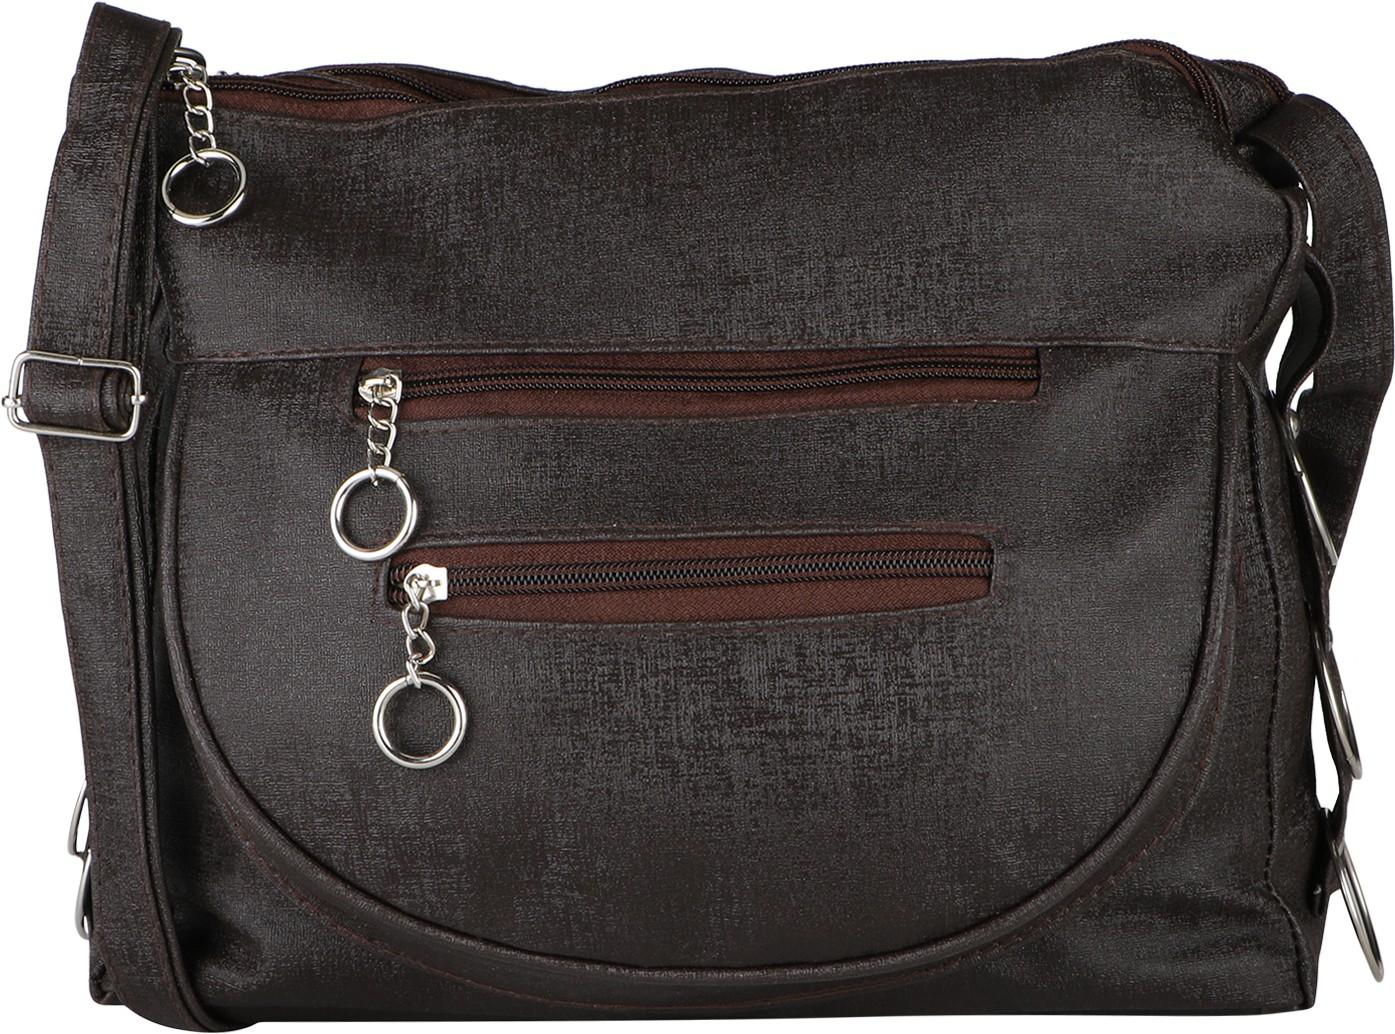 Sling bag below 500 - Bhuviart Women Multicolor Pu Sling Bag